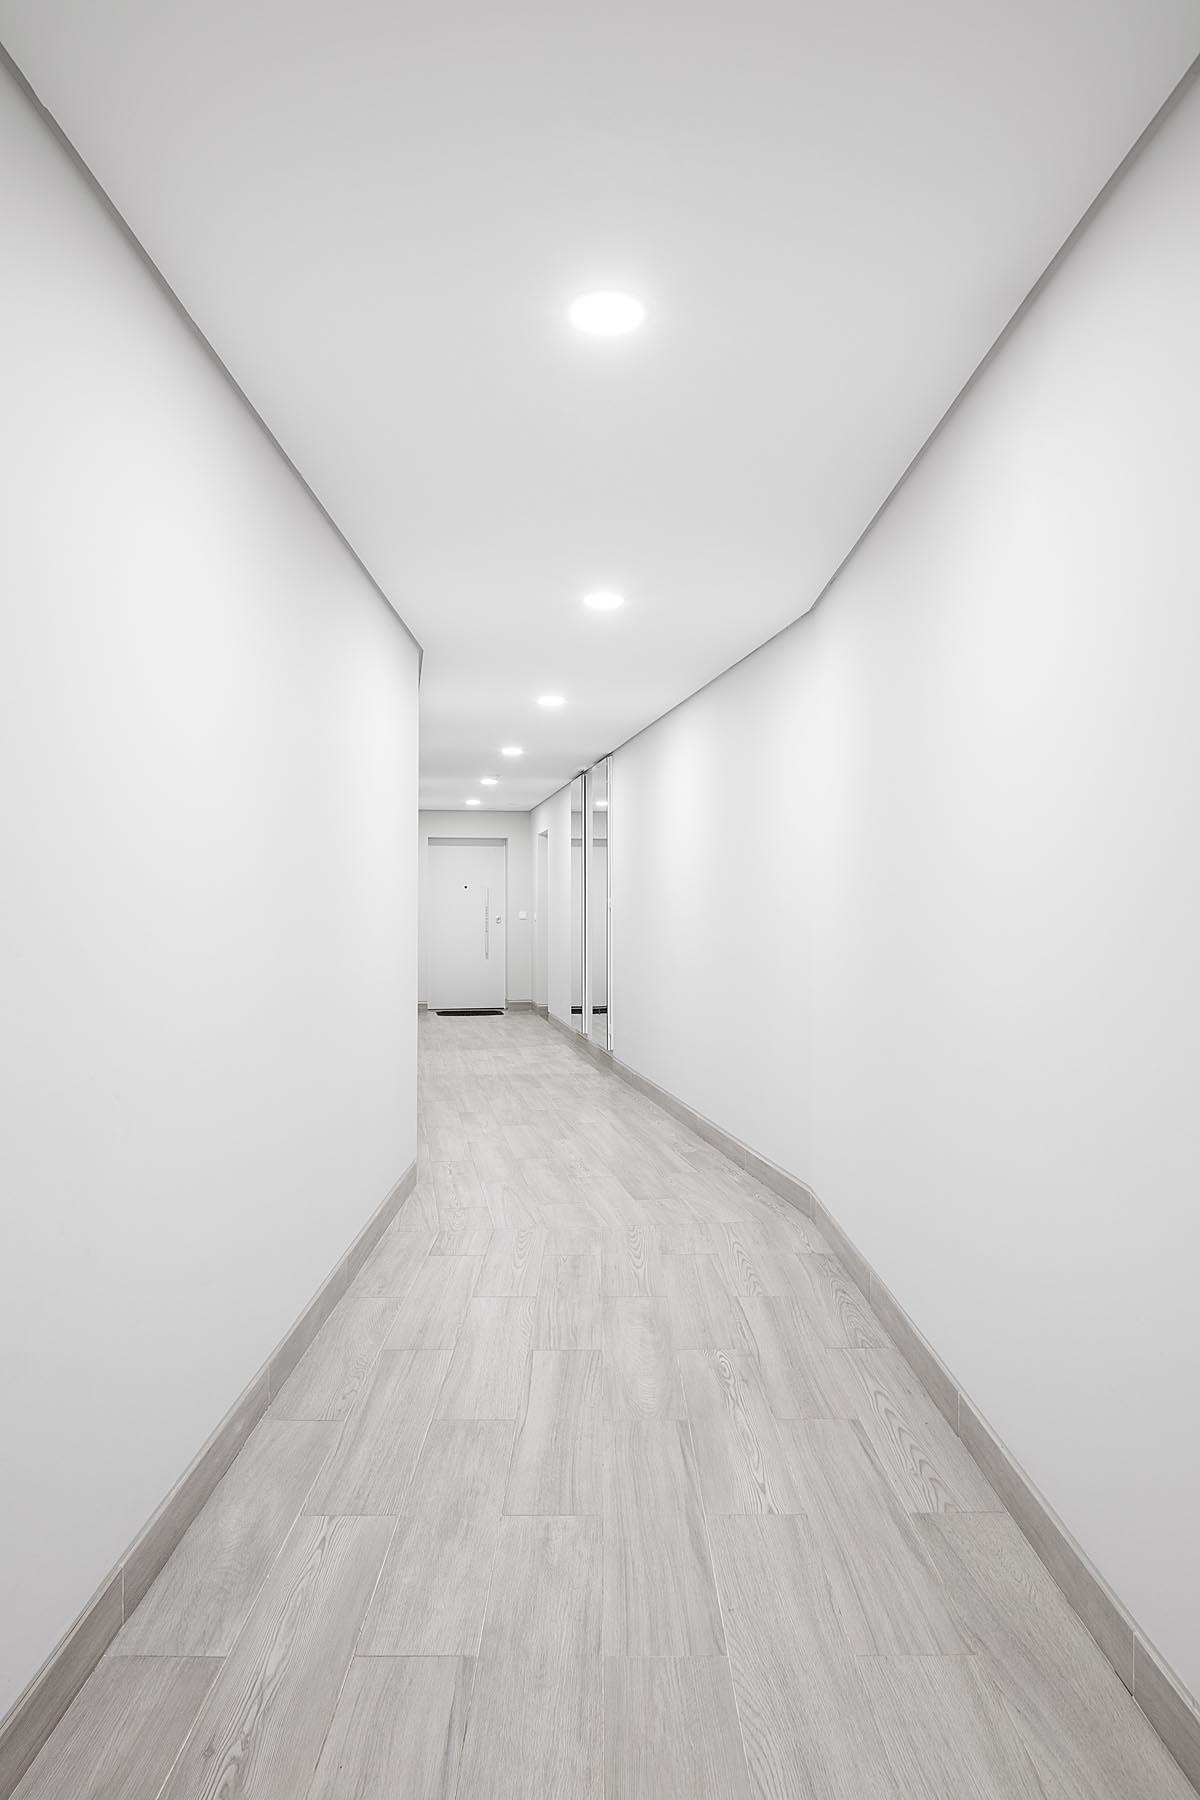 Rosaforte Rosabuilding corredor - natural grey